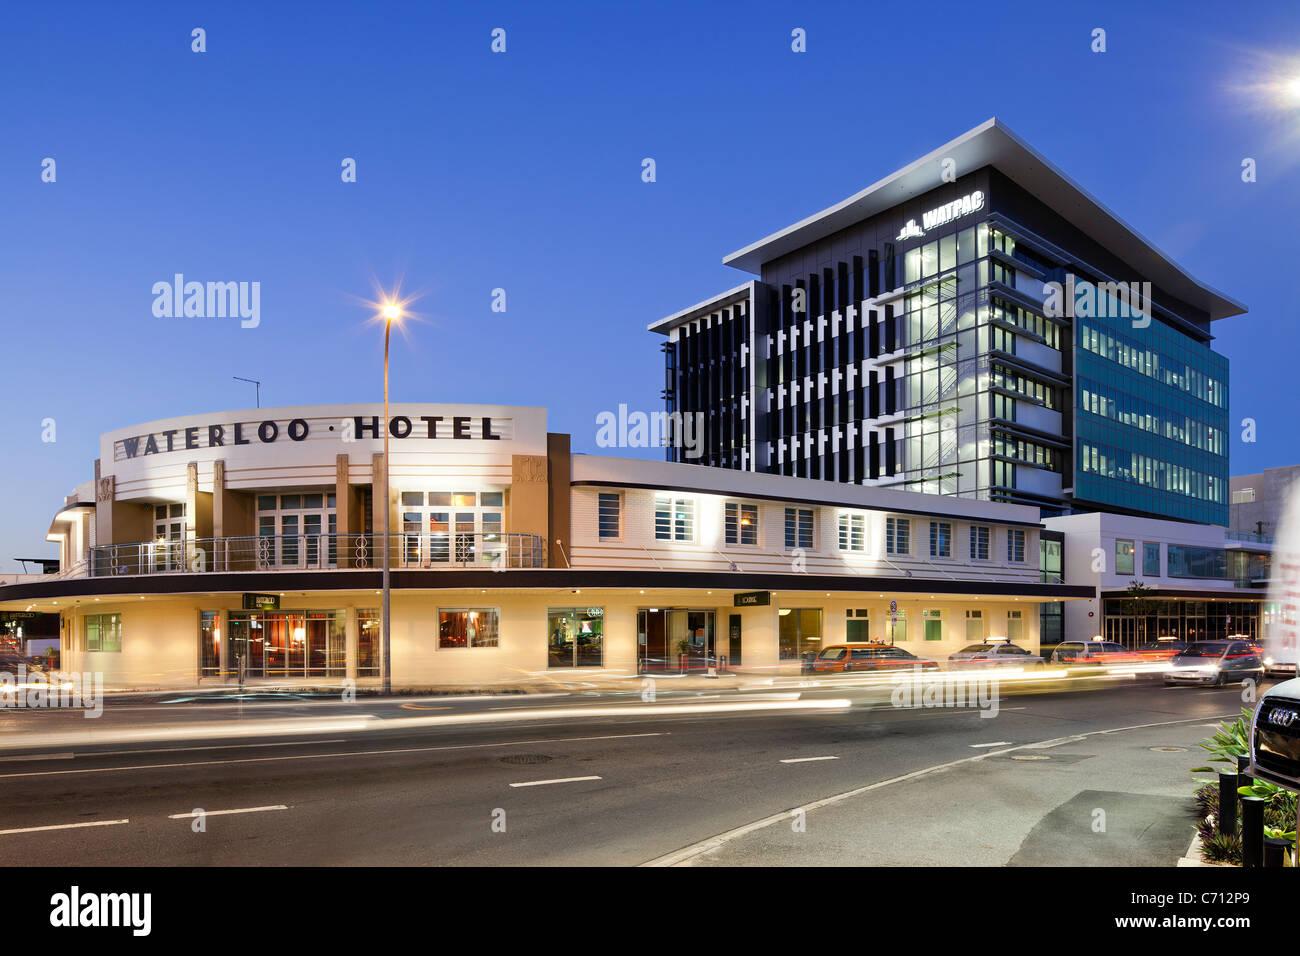 Waterloo Hotel, Brisbane - Stock Image